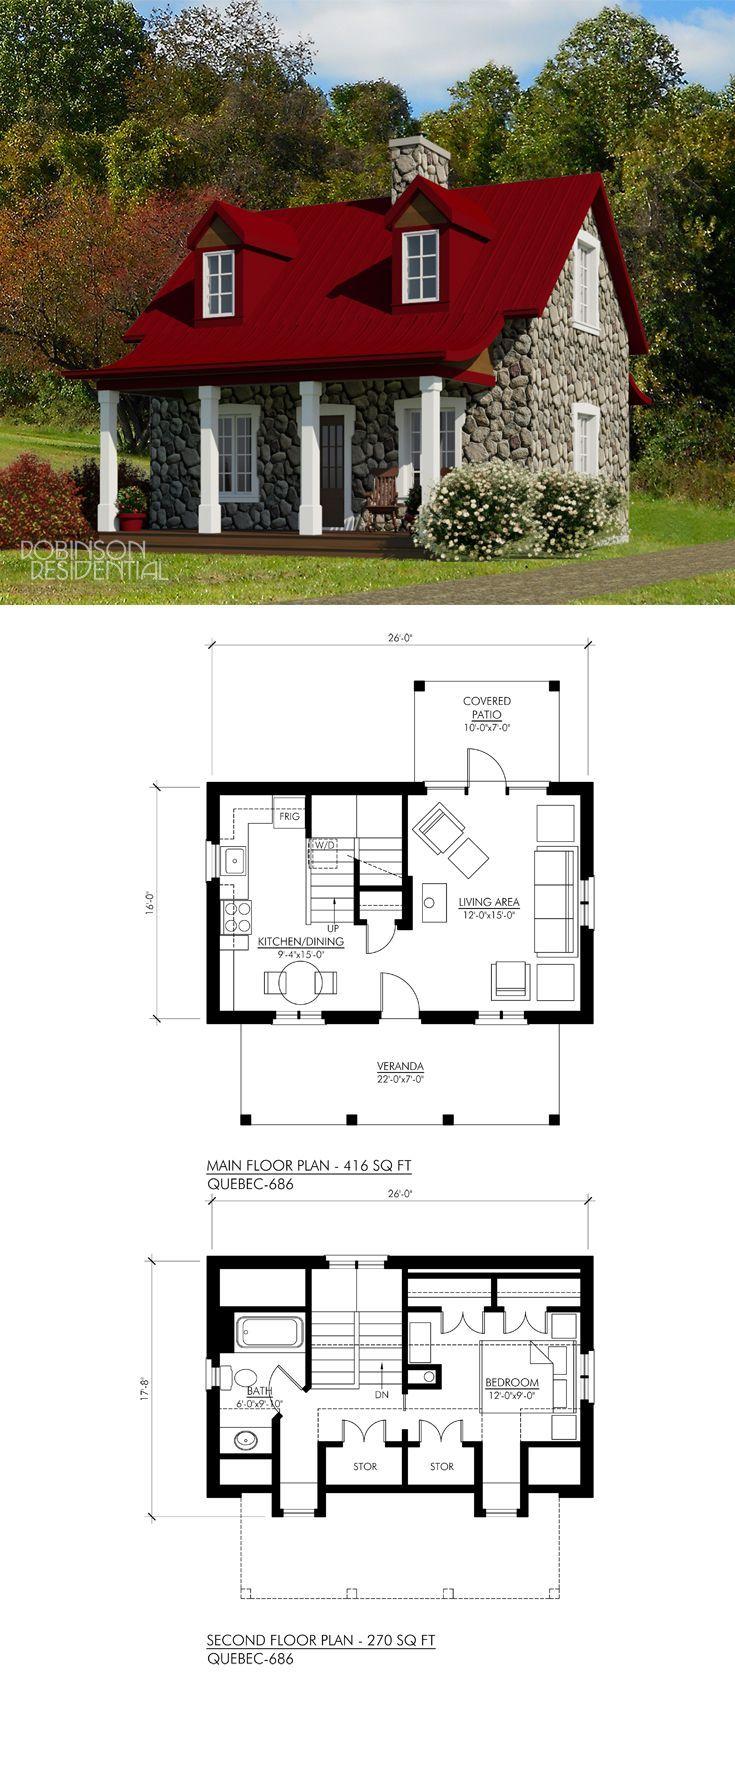 25 Best Tiny House Plansquebec 686 686 Sq Ft 1 Bedroom 1 Bath In 2020 Tiny House Plans House Plans Floor Plans